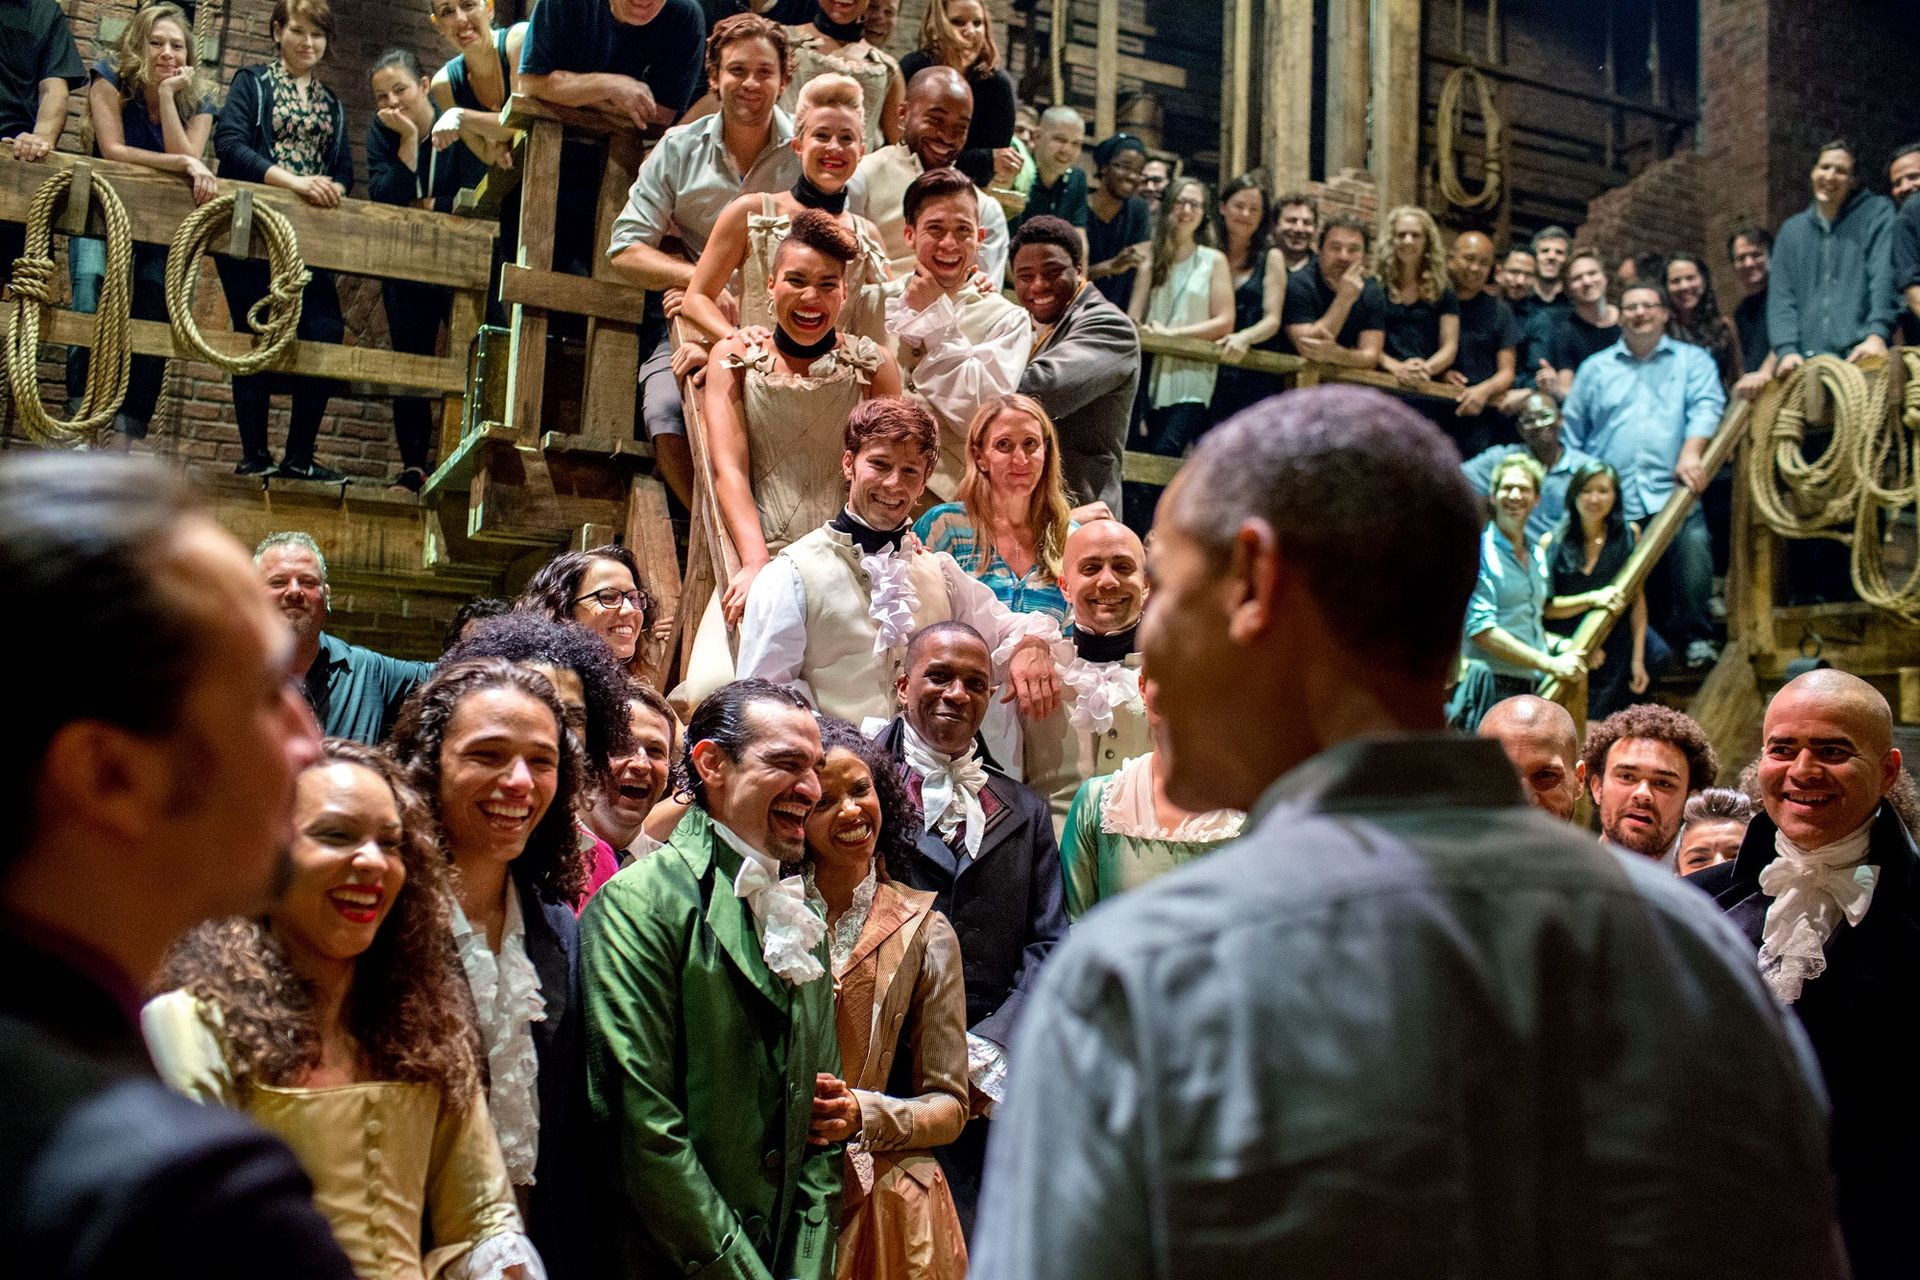 Obama Hamilton cast